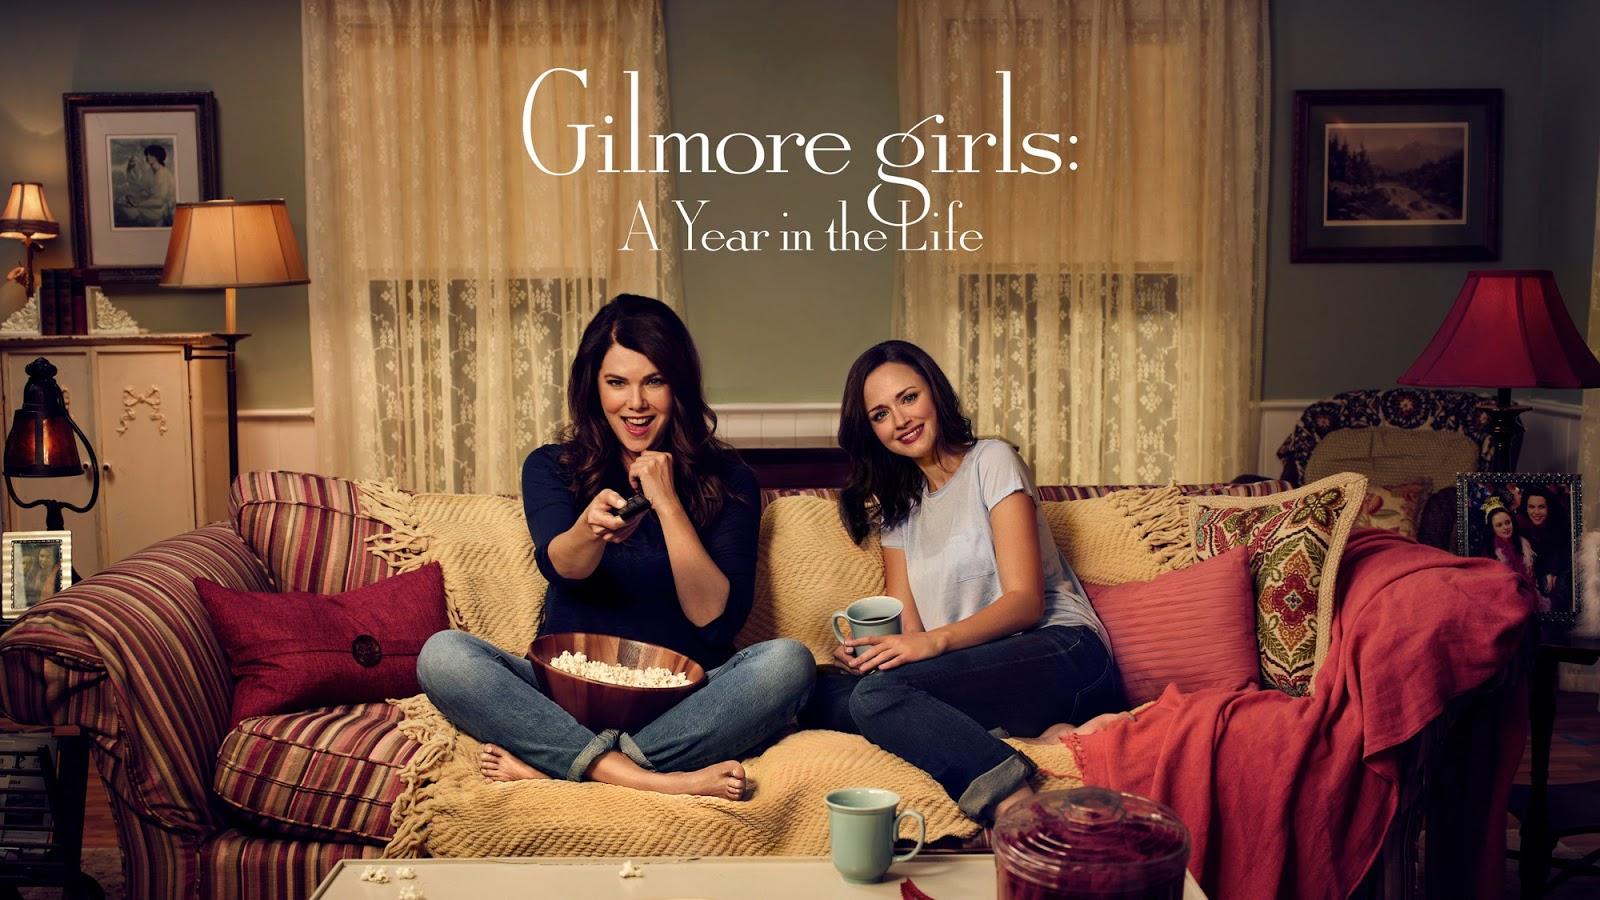 Imagen promocional de Netflix con Lorelai y Rory para 'Gilmore Girls: A Year in the Life'